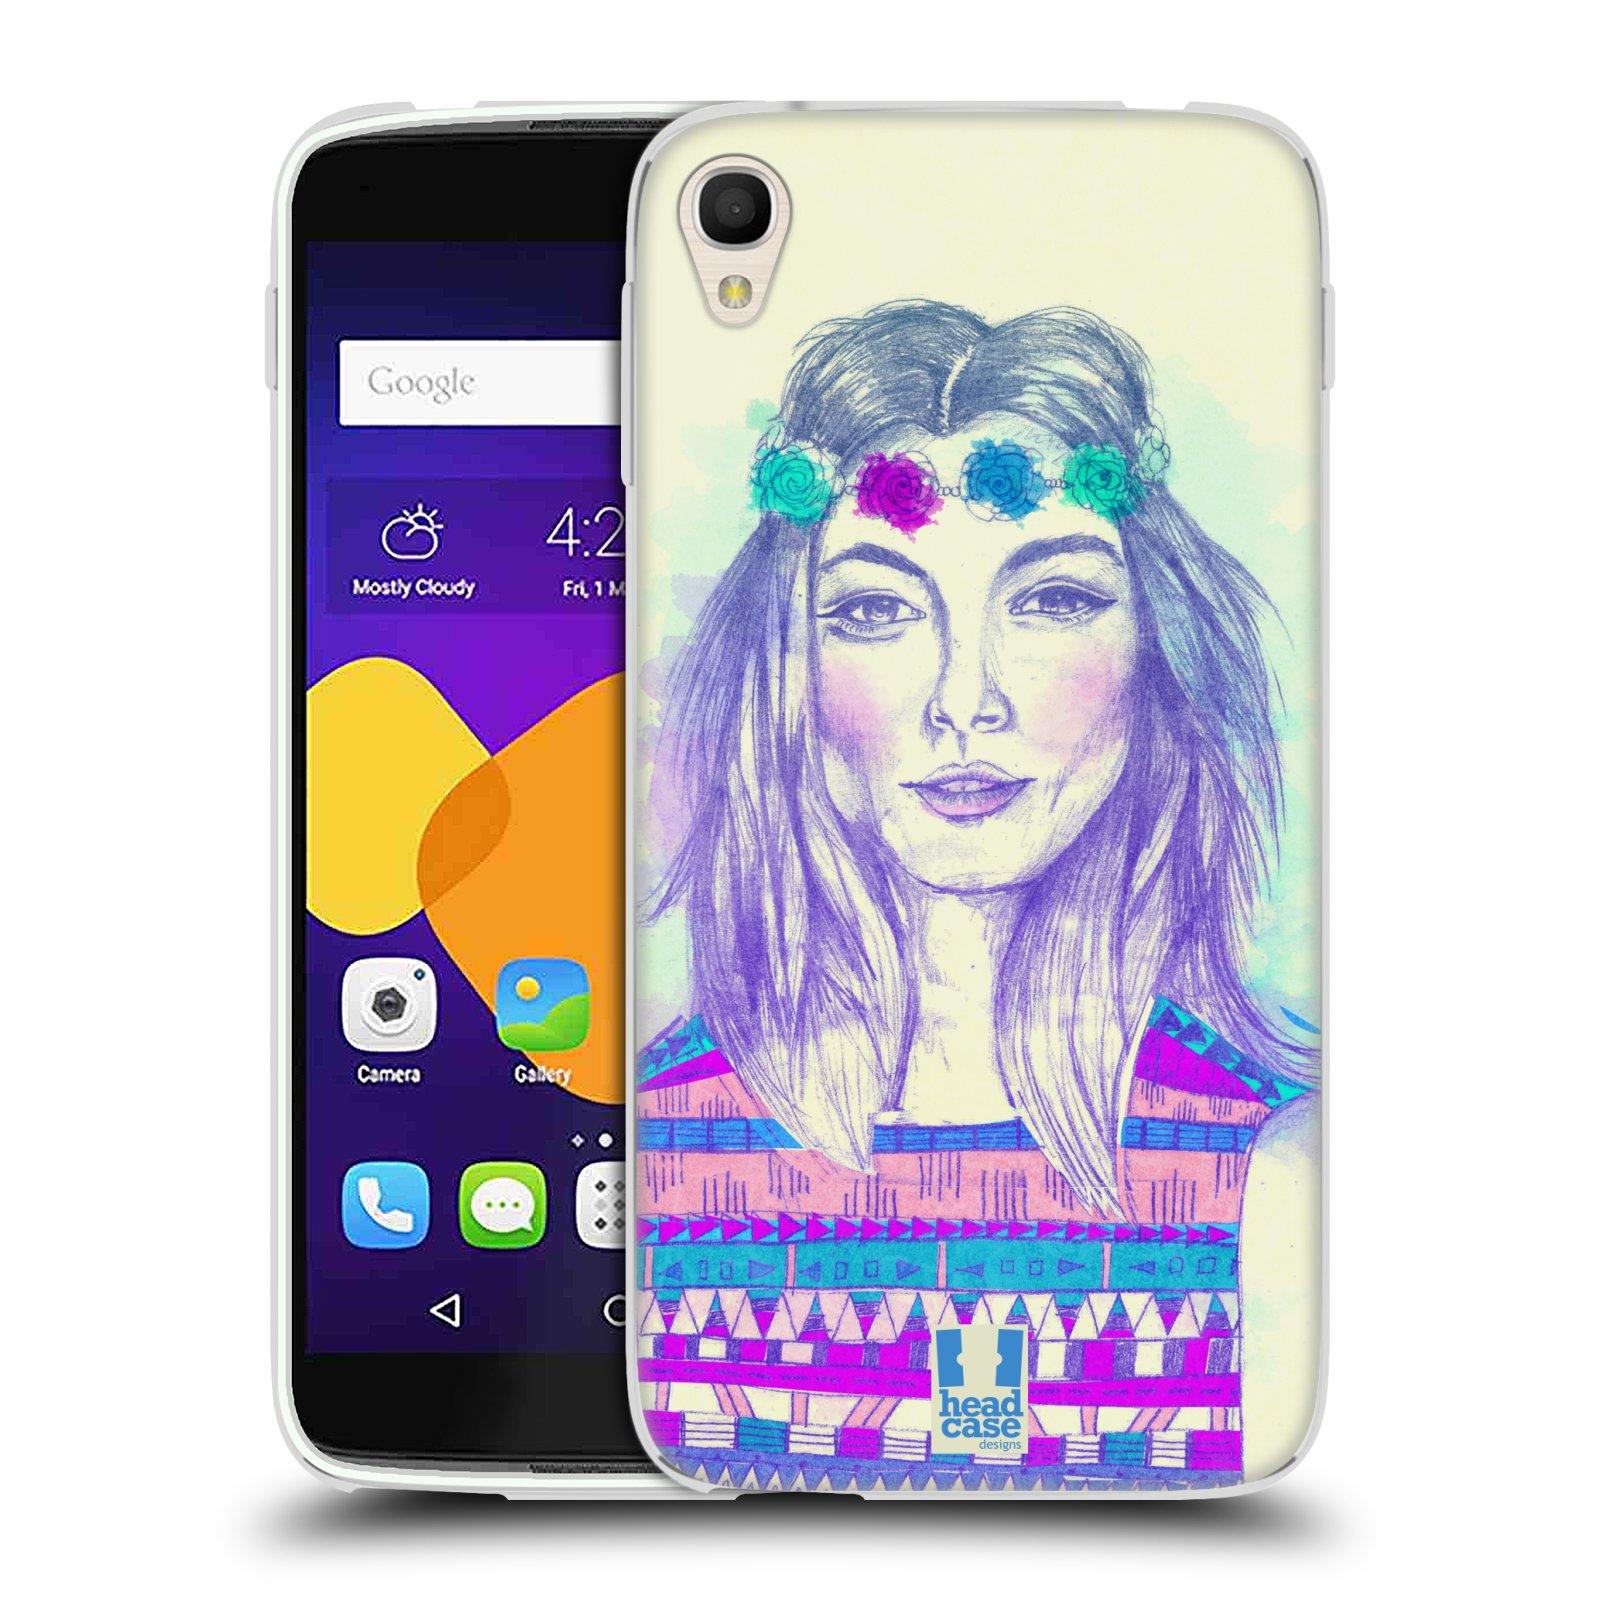 HEAD CASE silikonový obal na mobil Alcatel Idol 3 OT-6045Y (5.5) vzor Dívka dlouhé květinové vlasy HIPPIE modrá